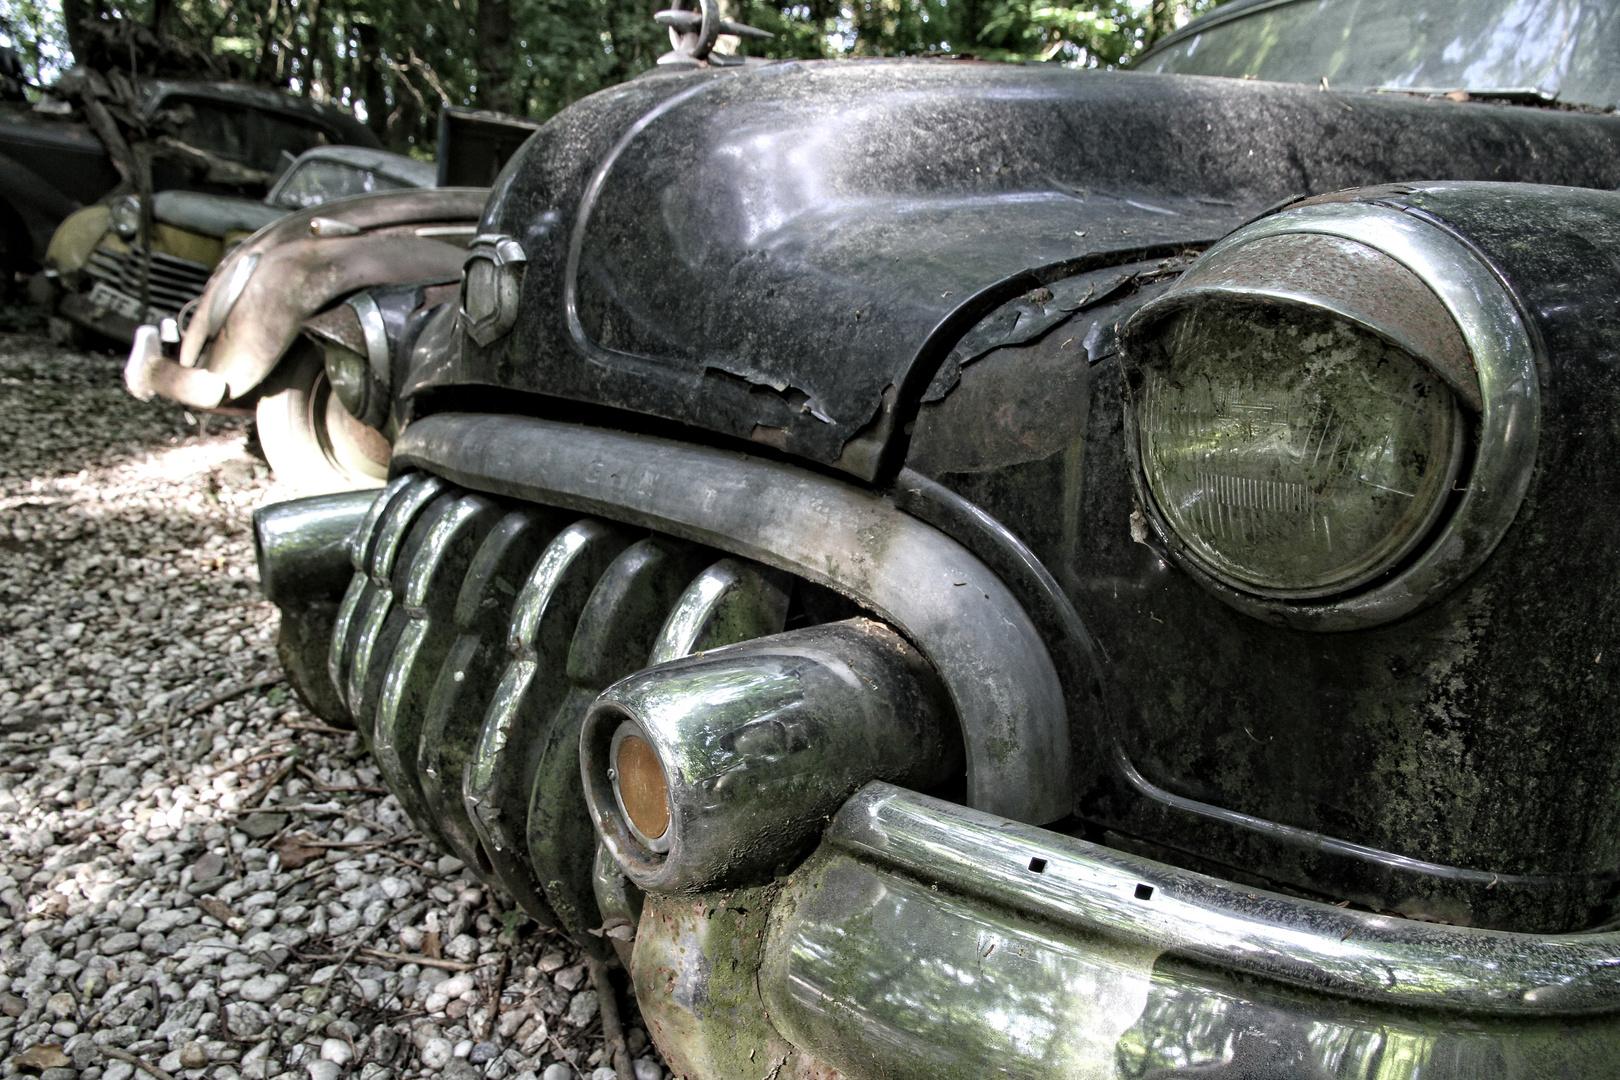 Autoskulpturenpark Neandertal - Buick III